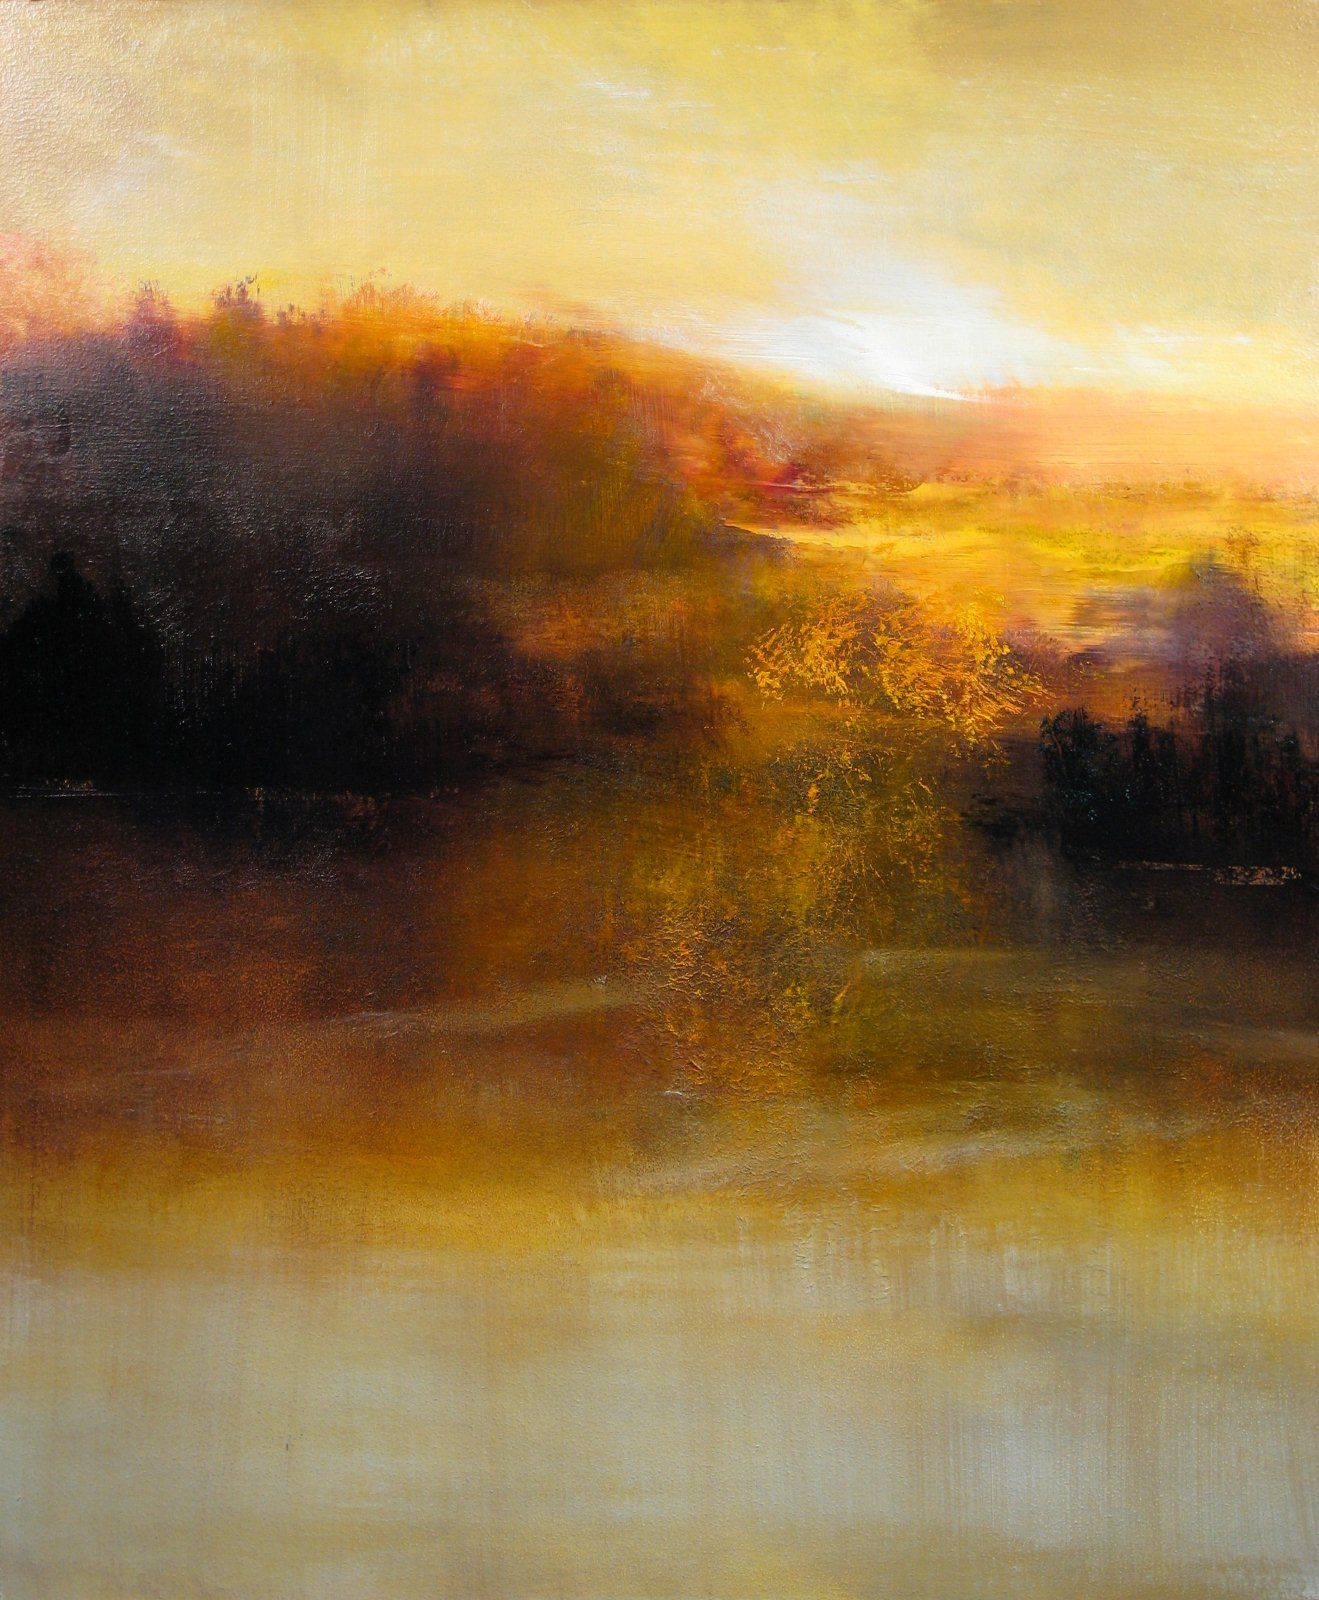 Sunrise Maurice Sapiro Sunrise Art Painting Abstract Art Landscape Sunrise Art